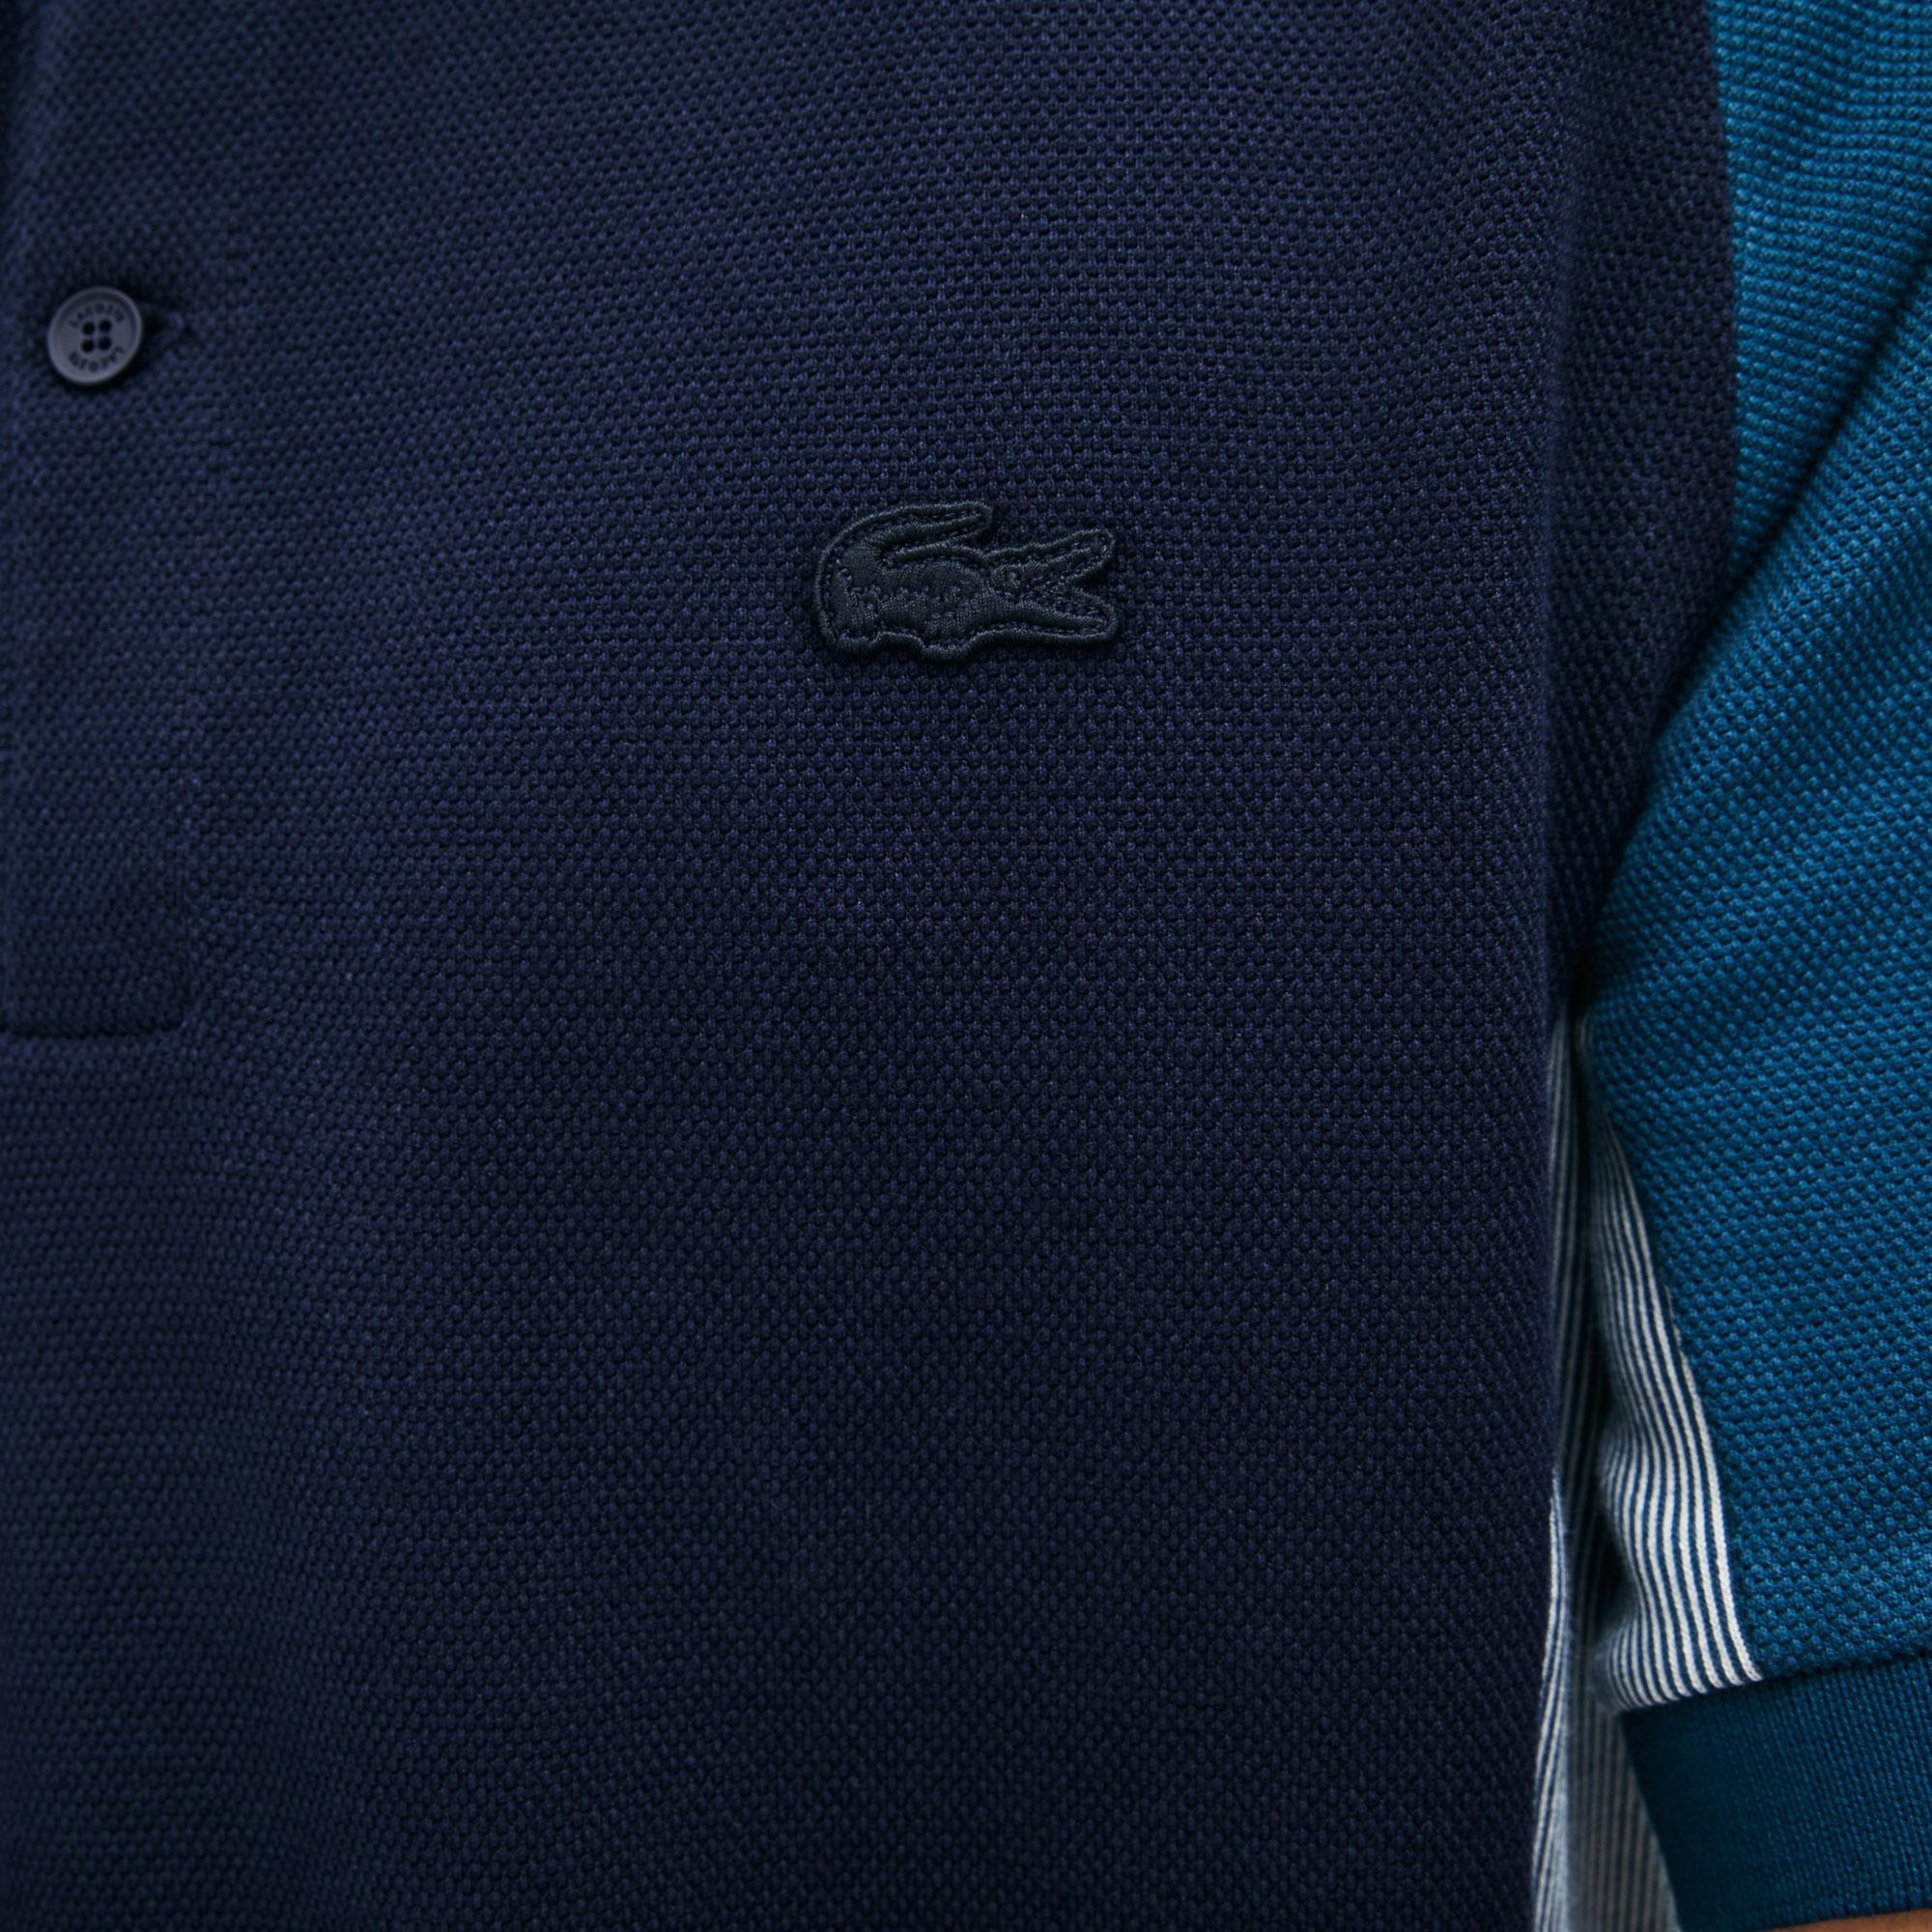 Lacoste Erkek Regular Fit Blok Desenli Mavi Polo